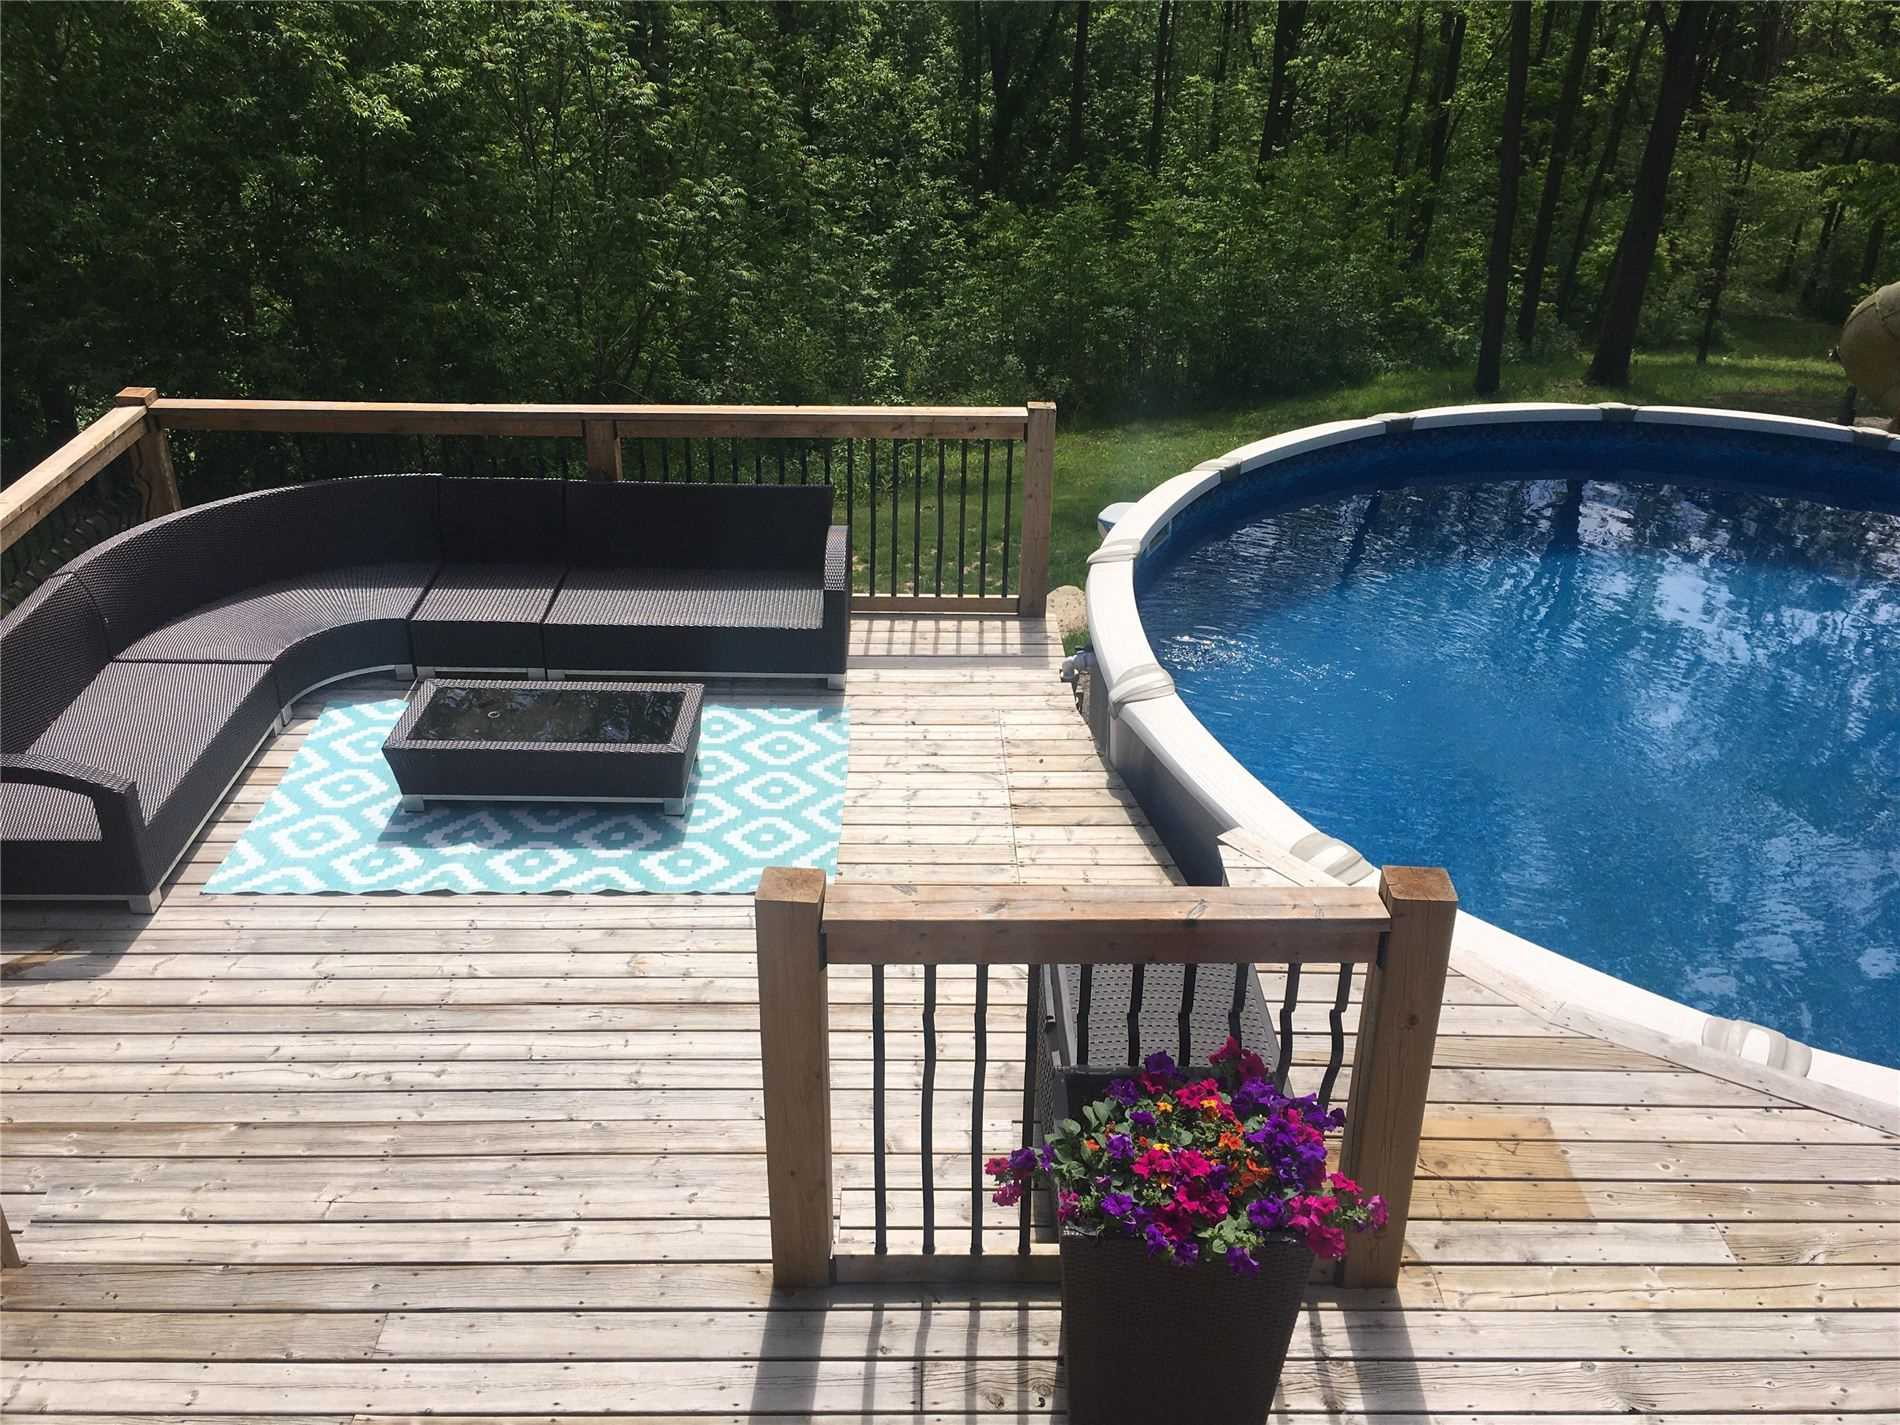 213 Johnson Rd, Brant, Ontario N3T 5M1, 4 Bedrooms Bedrooms, 9 Rooms Rooms,5 BathroomsBathrooms,Detached,For Sale,Johnson,X5259461